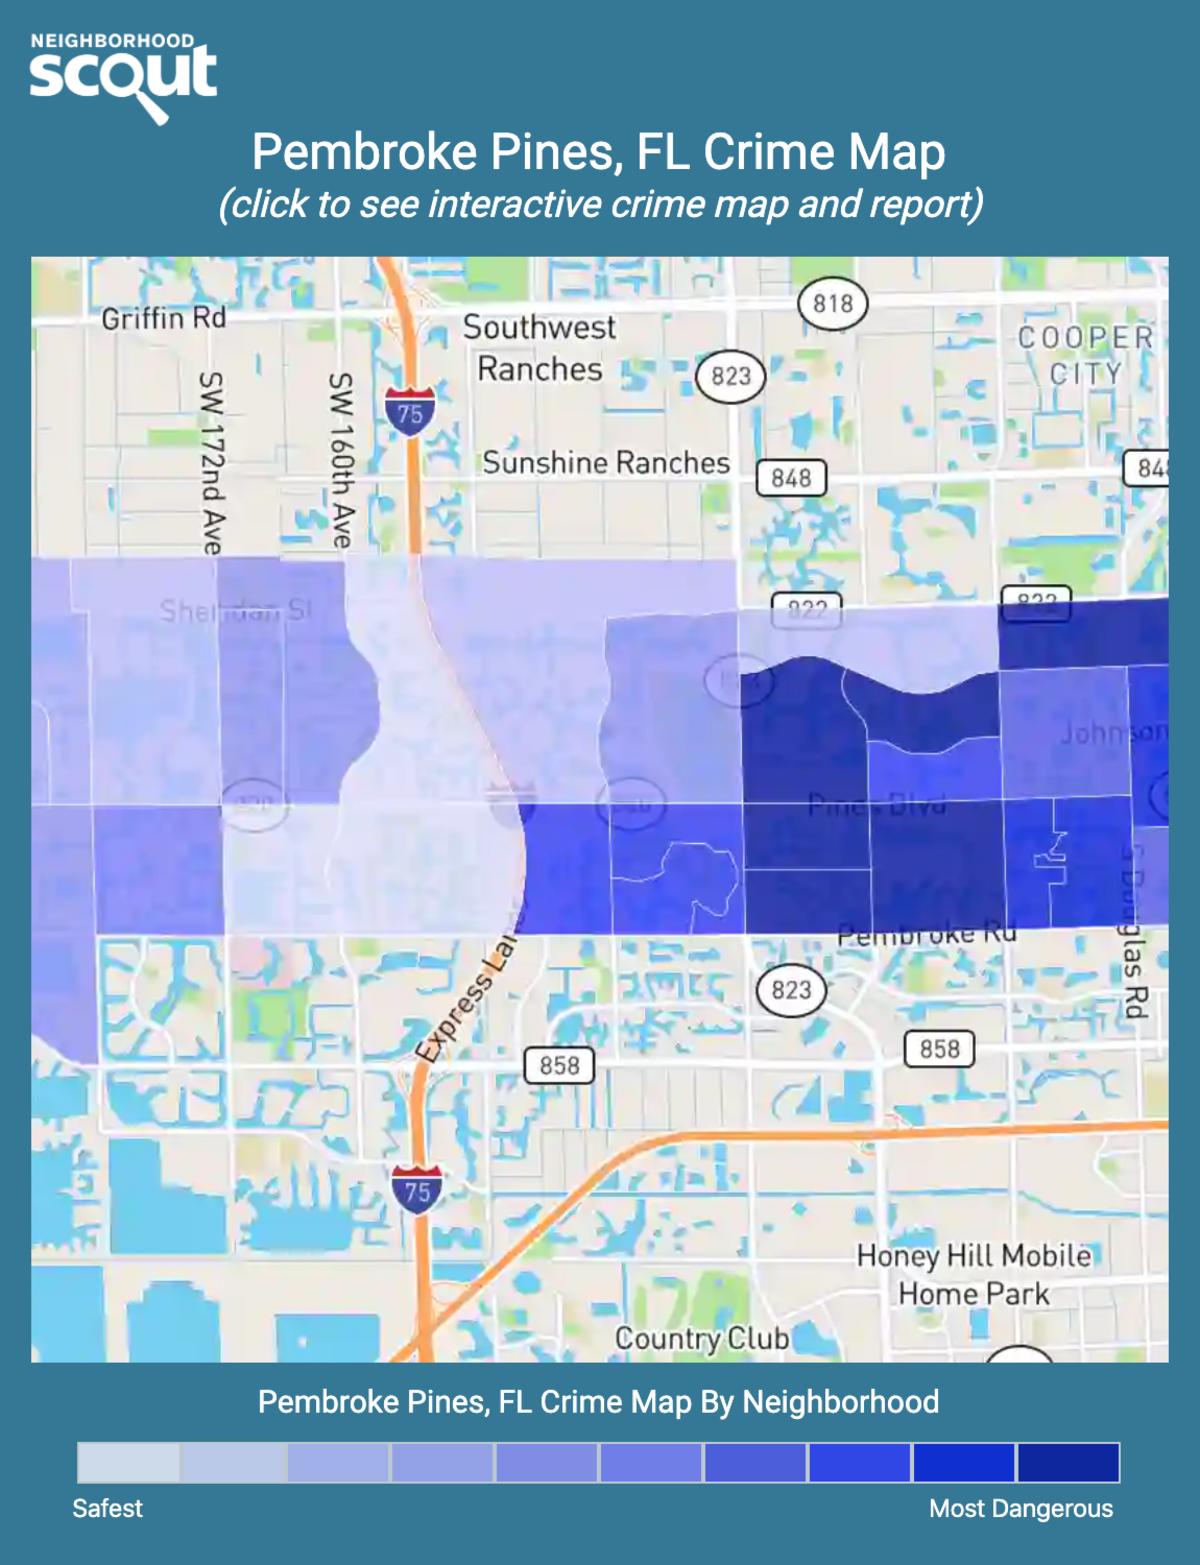 Pembroke Pines, Florida crime map